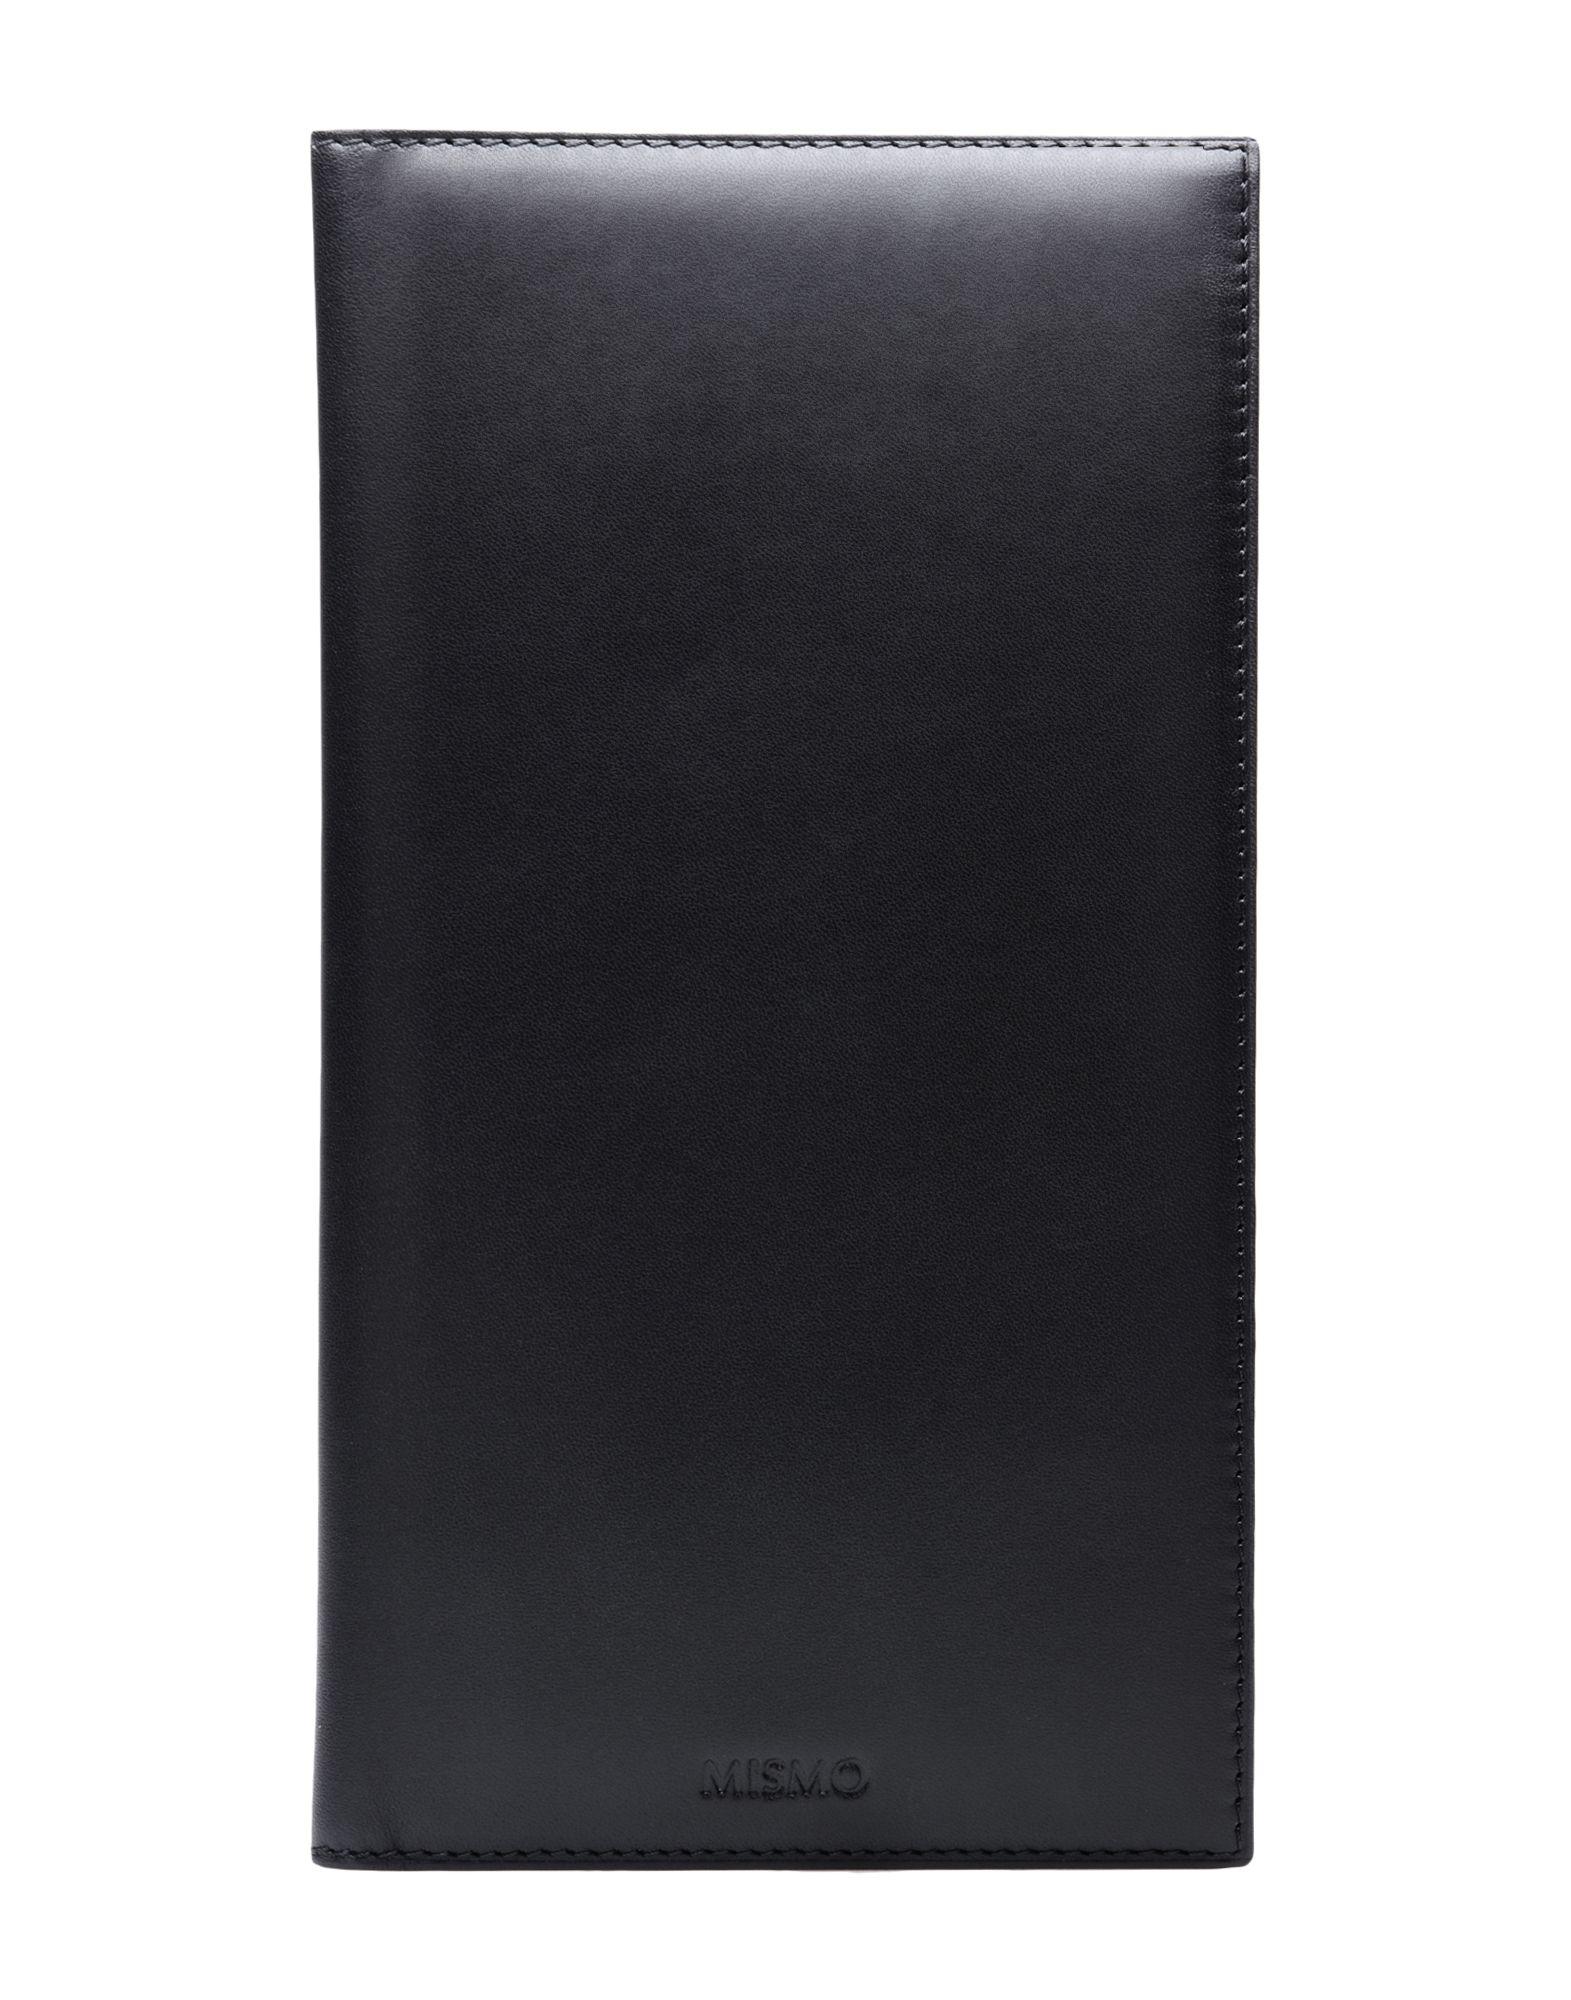 MISMO Document Holders in Black